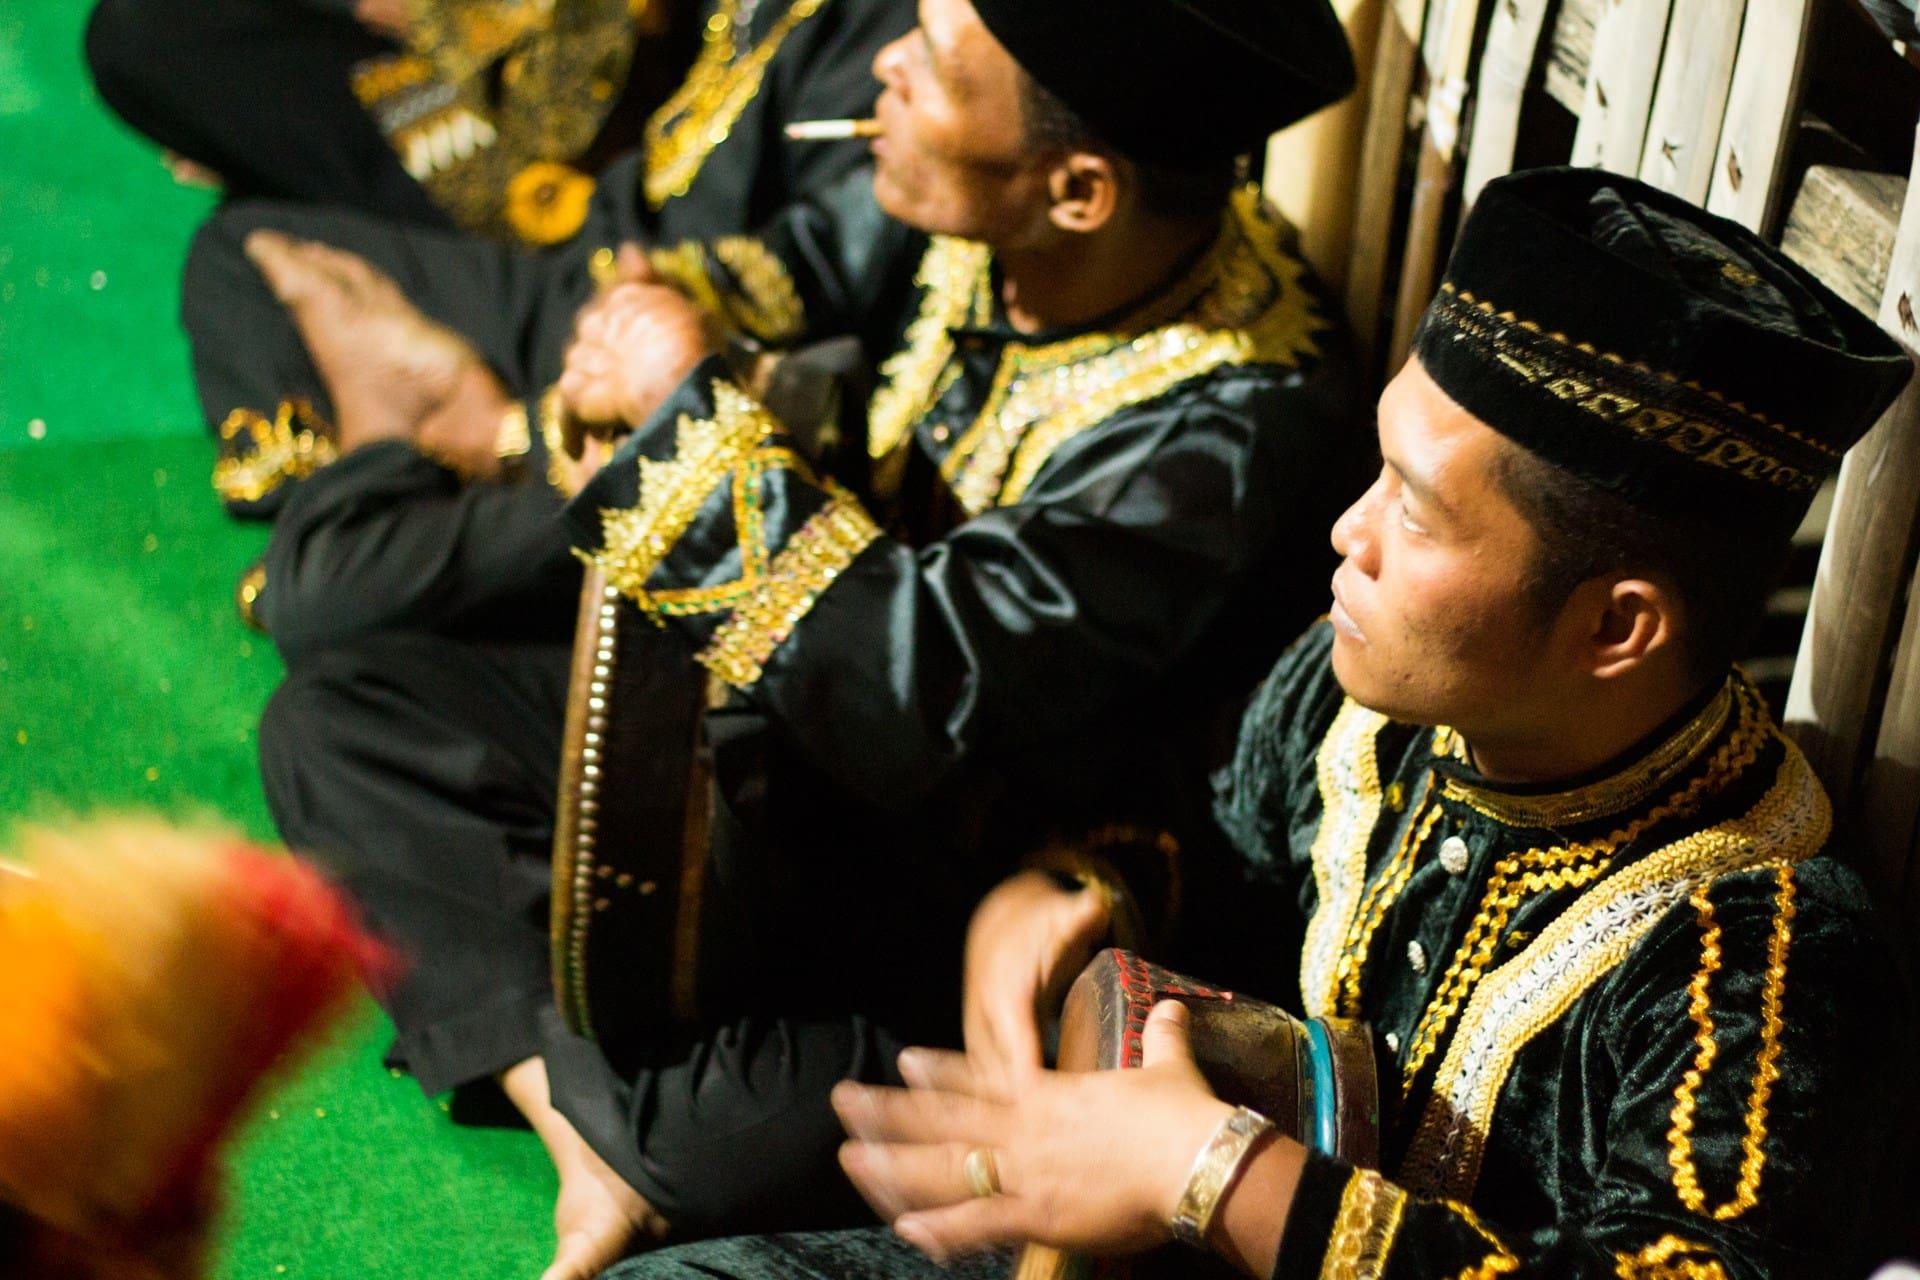 Traditional Drums and dress at a Kenduri Sko Festival, Koto Renah, Kerinci, Jambi